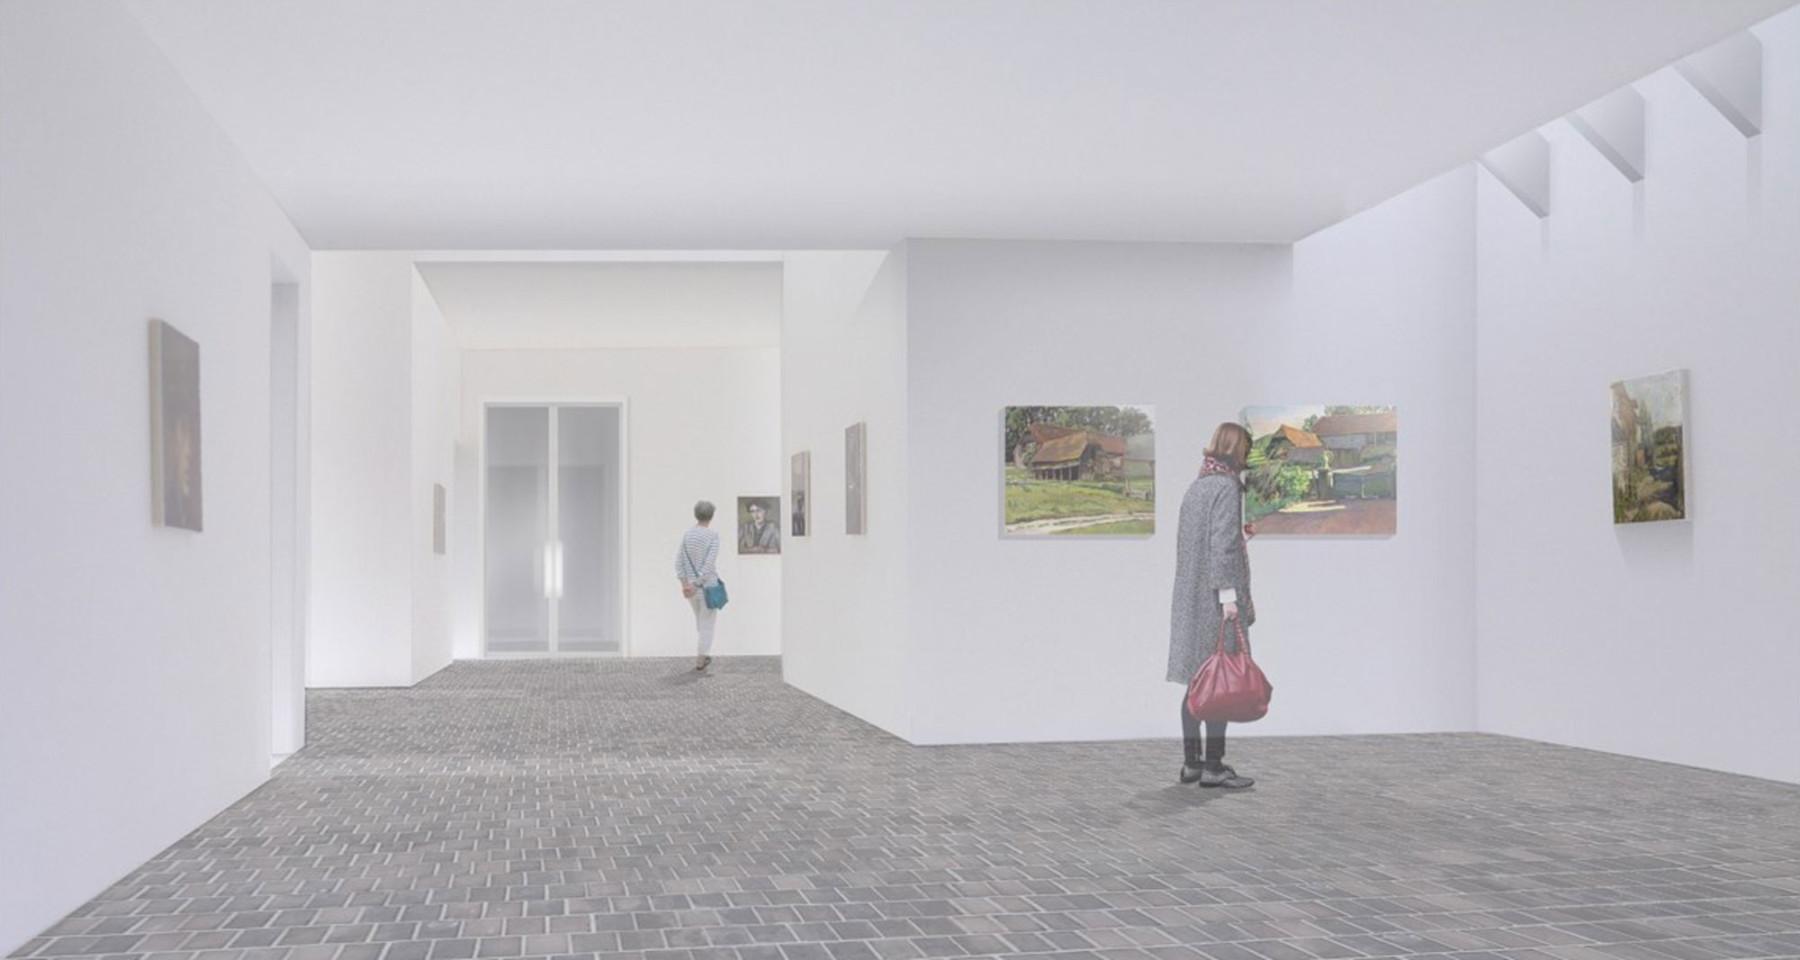 Gallery-interior-view-brick-floor-charleston-jamie-fobert